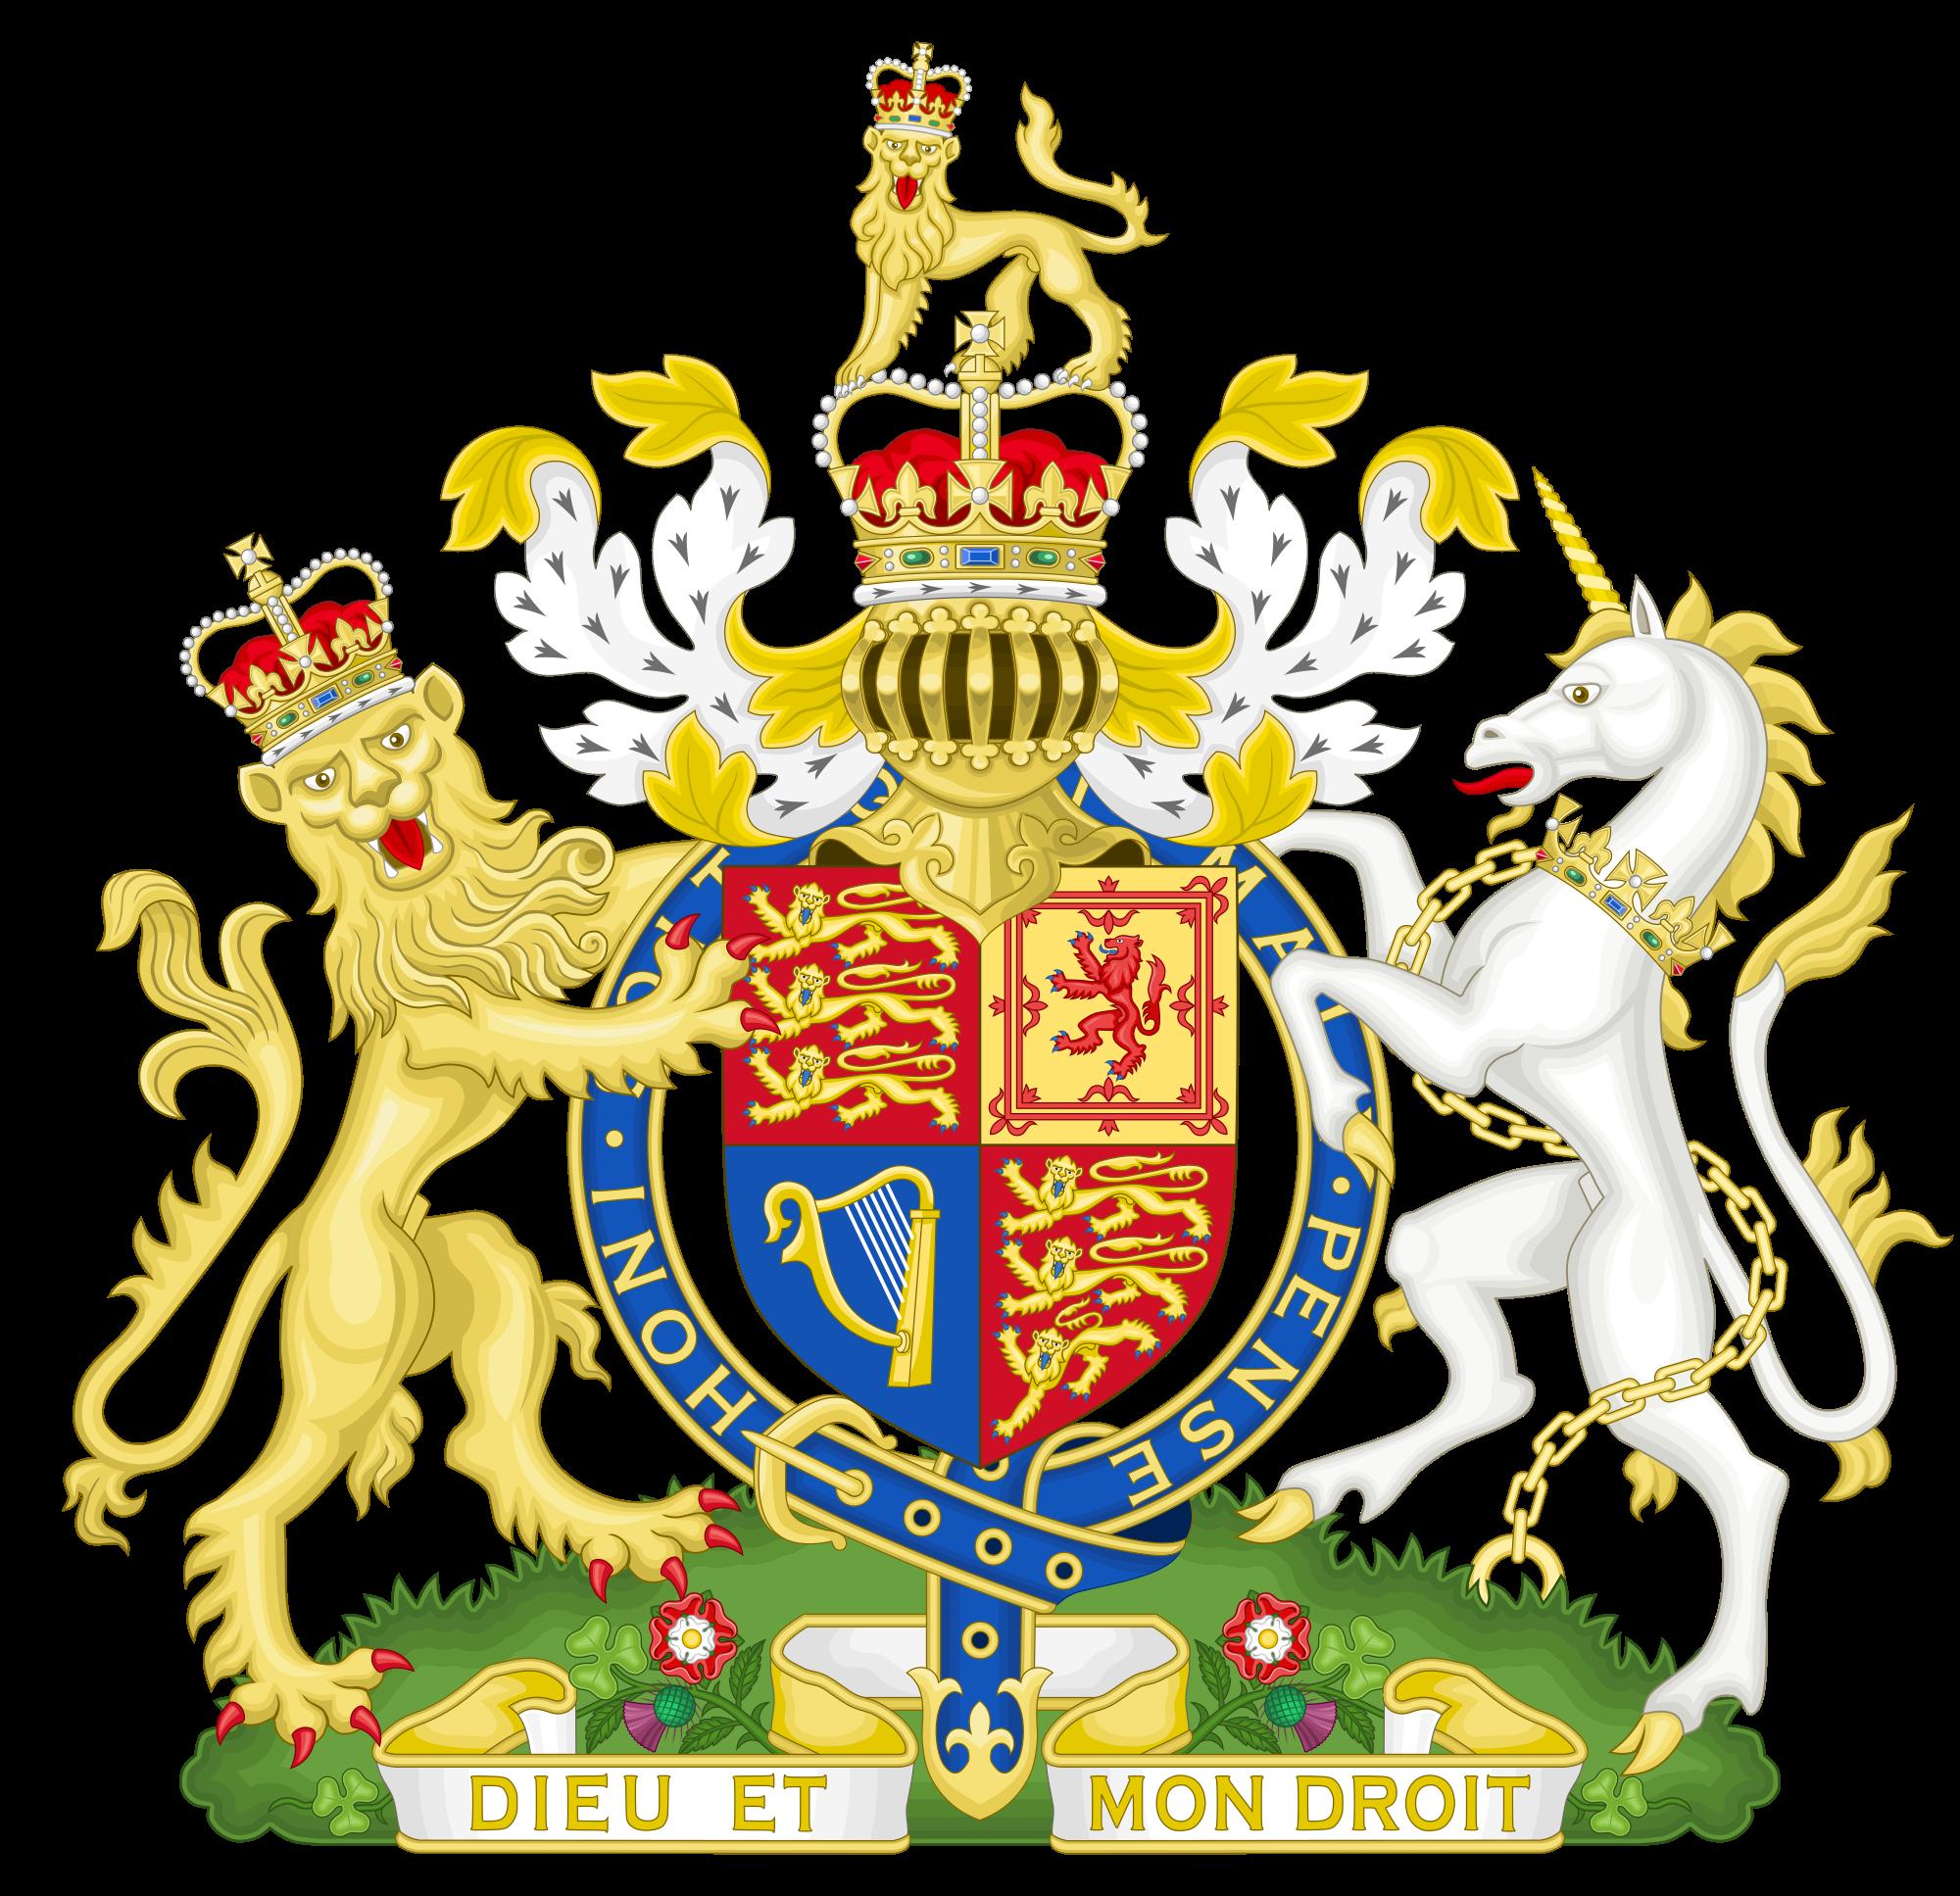 Shell clipart heraldic scallop. Dieu et mon droit